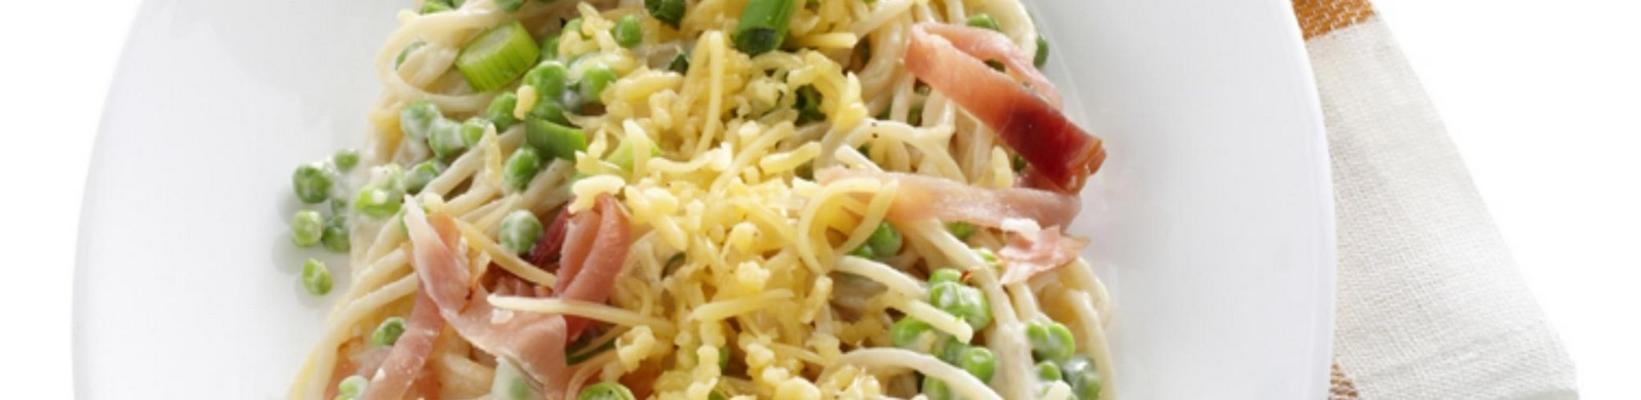 cream spaghetti with peas